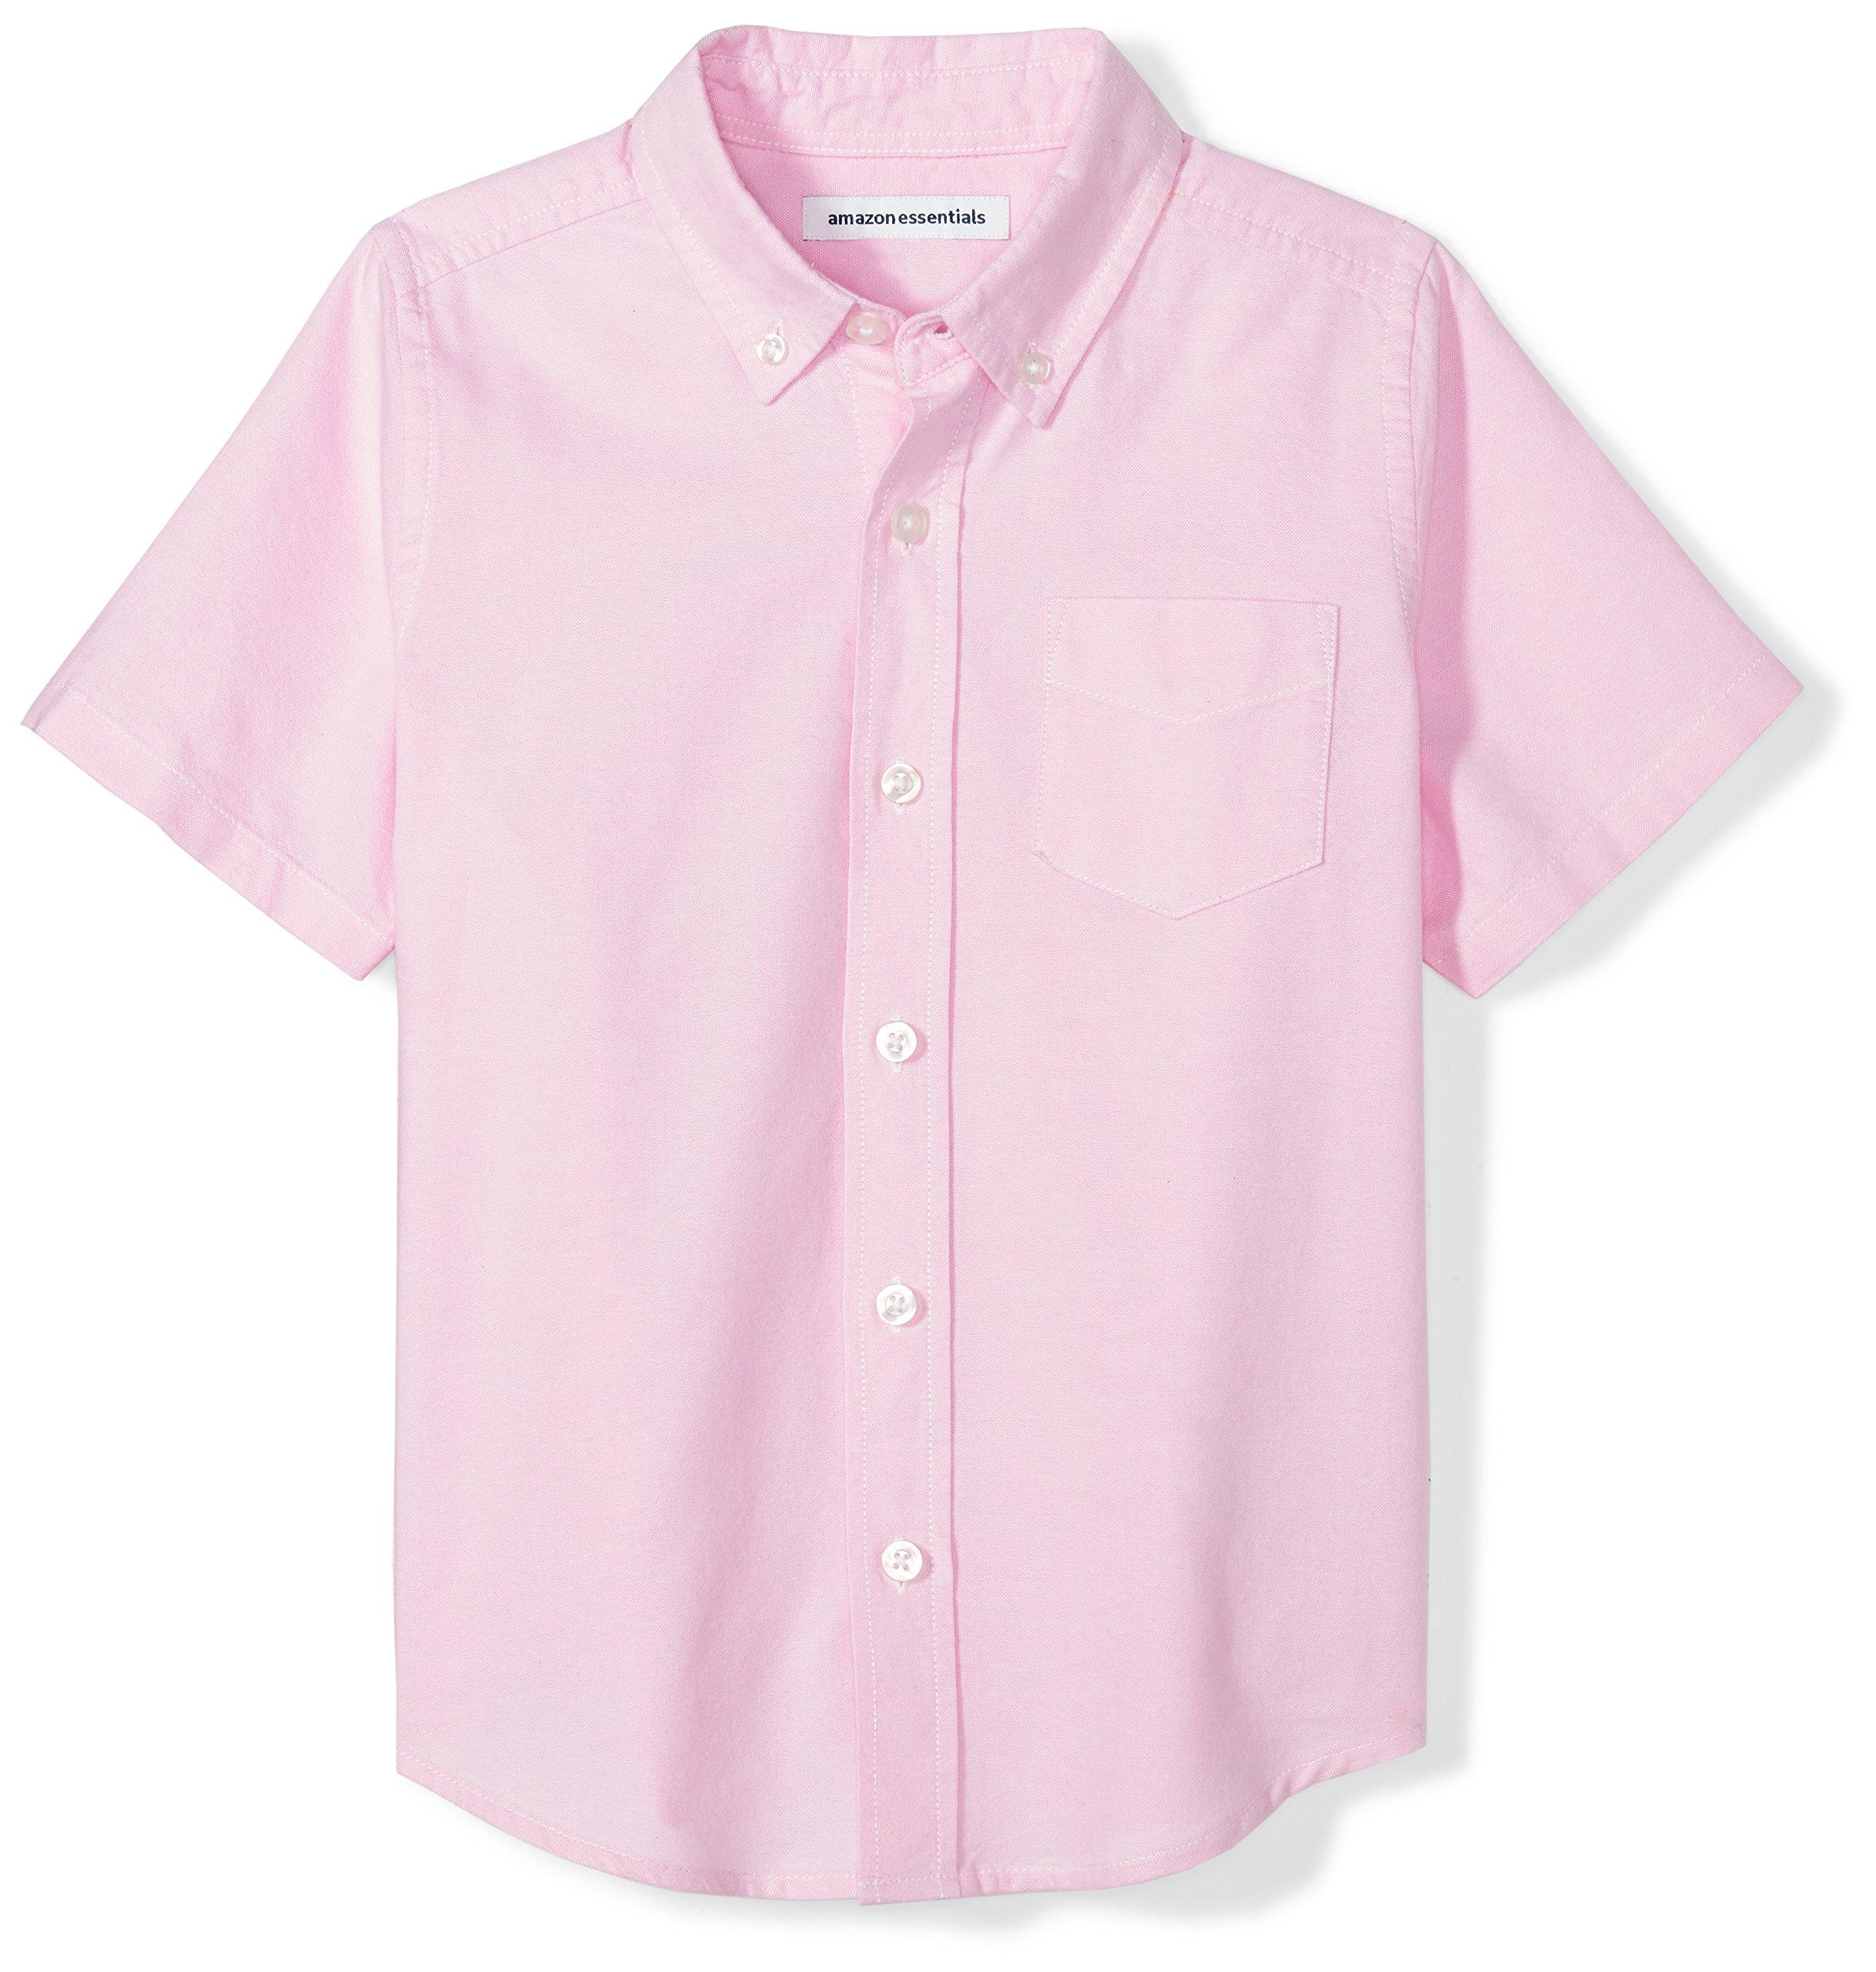 Amazon Essentials Boys' Short-Sleeve Uniform Oxford Shirt, Pink, XS (4-5)